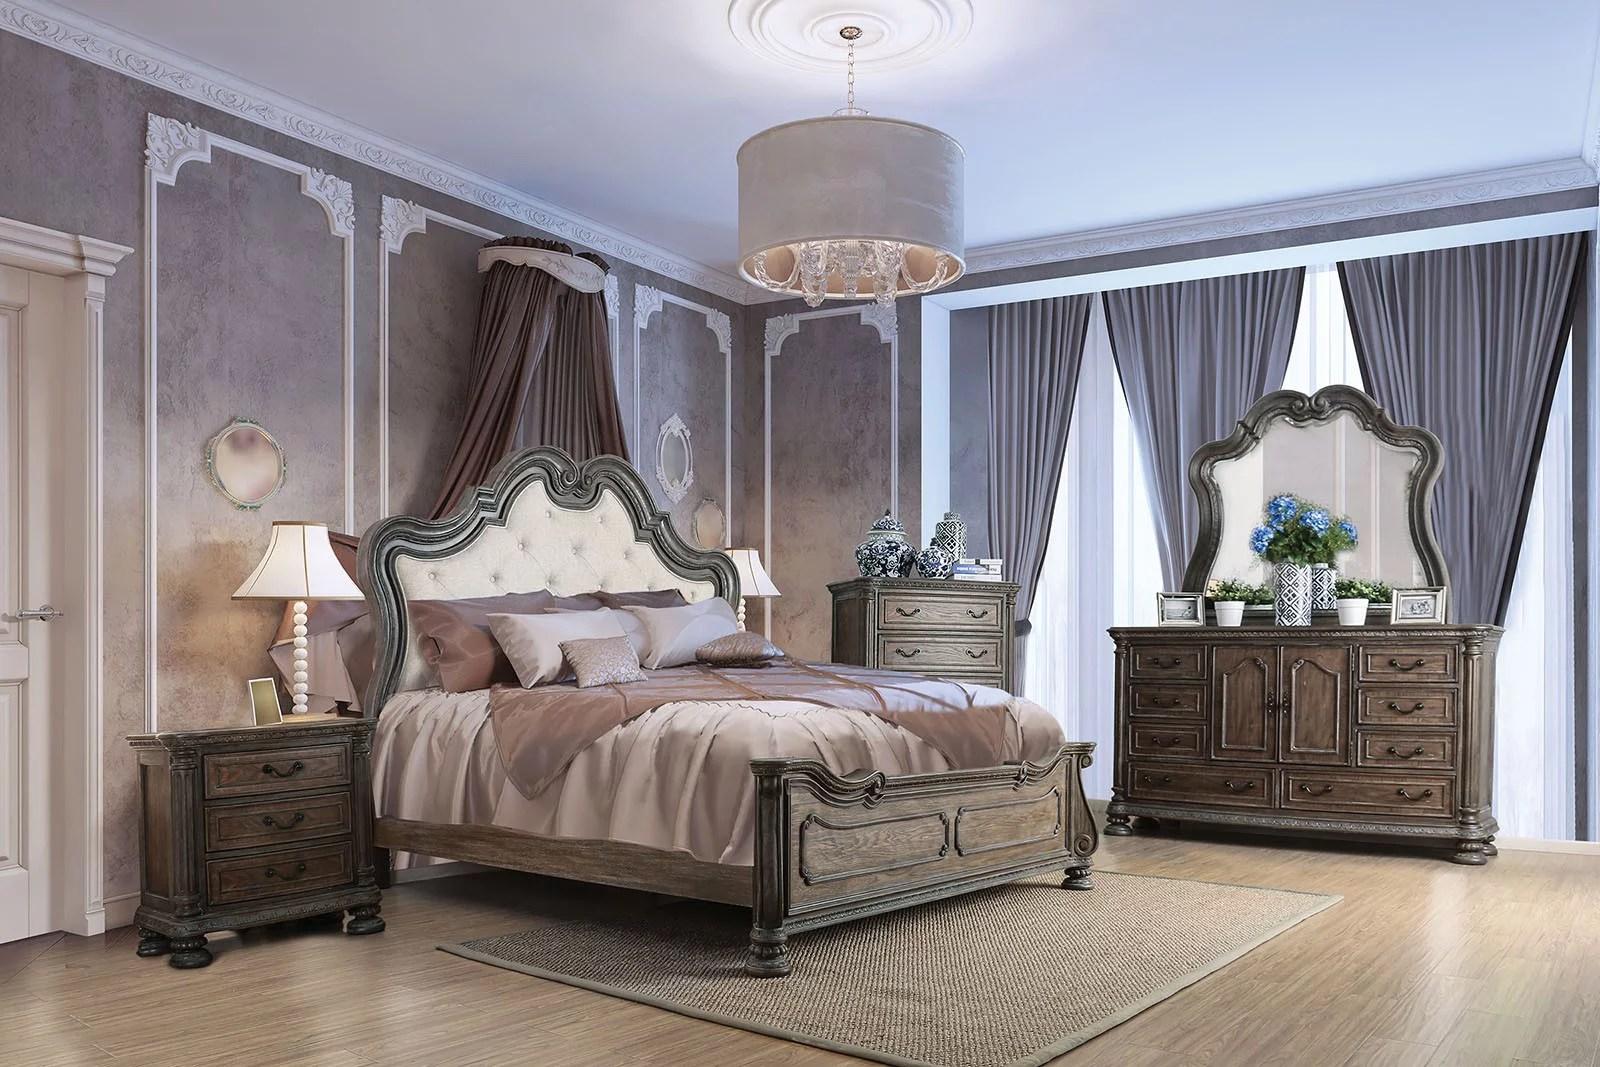 traditional bedroom furniture 4pc set